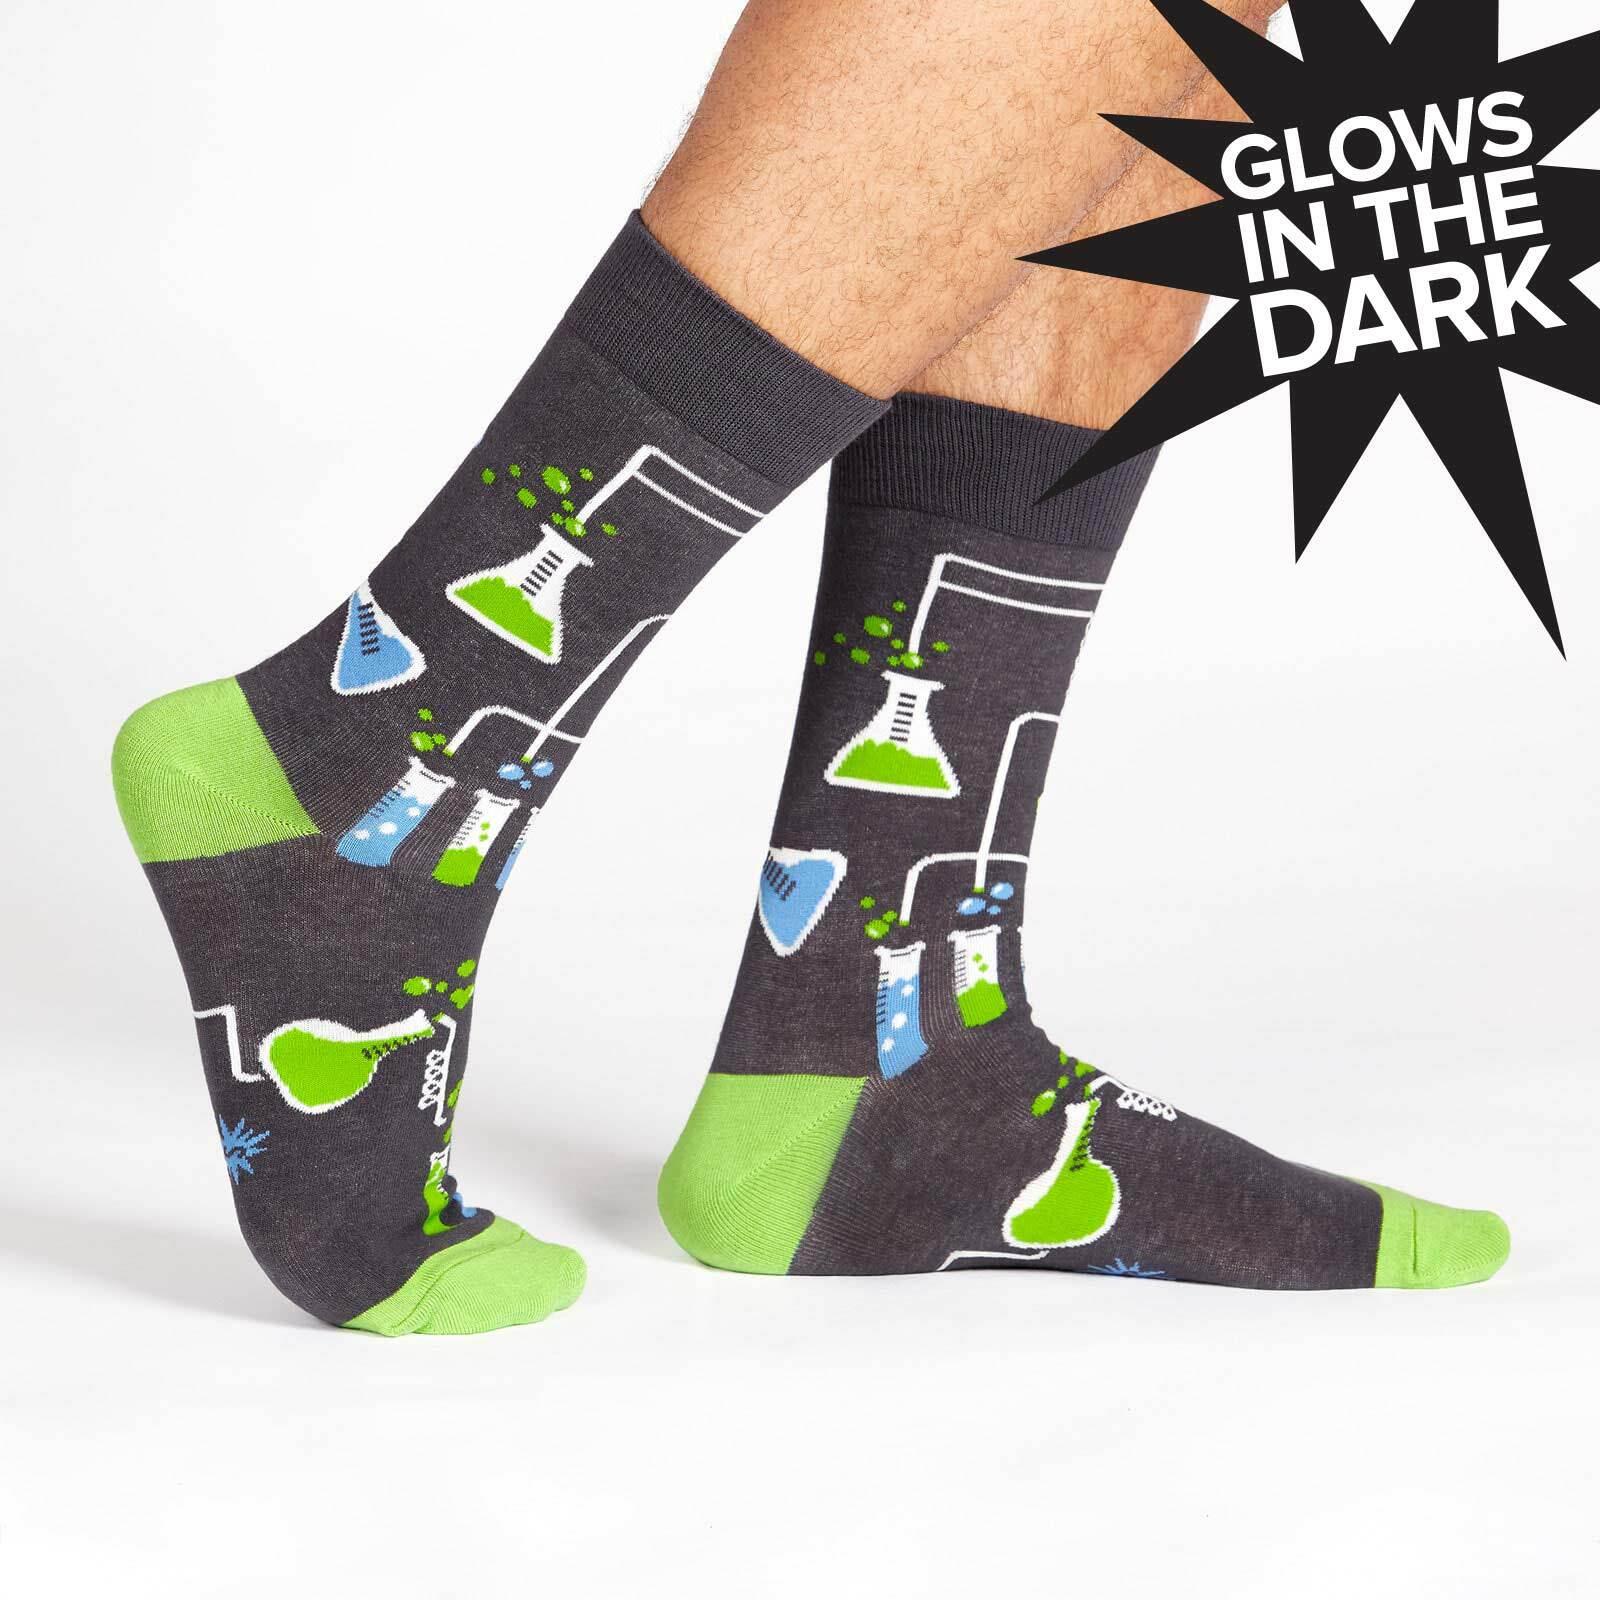 model wearing Laboratory Crew Socks - Glow In The Dark - Men's